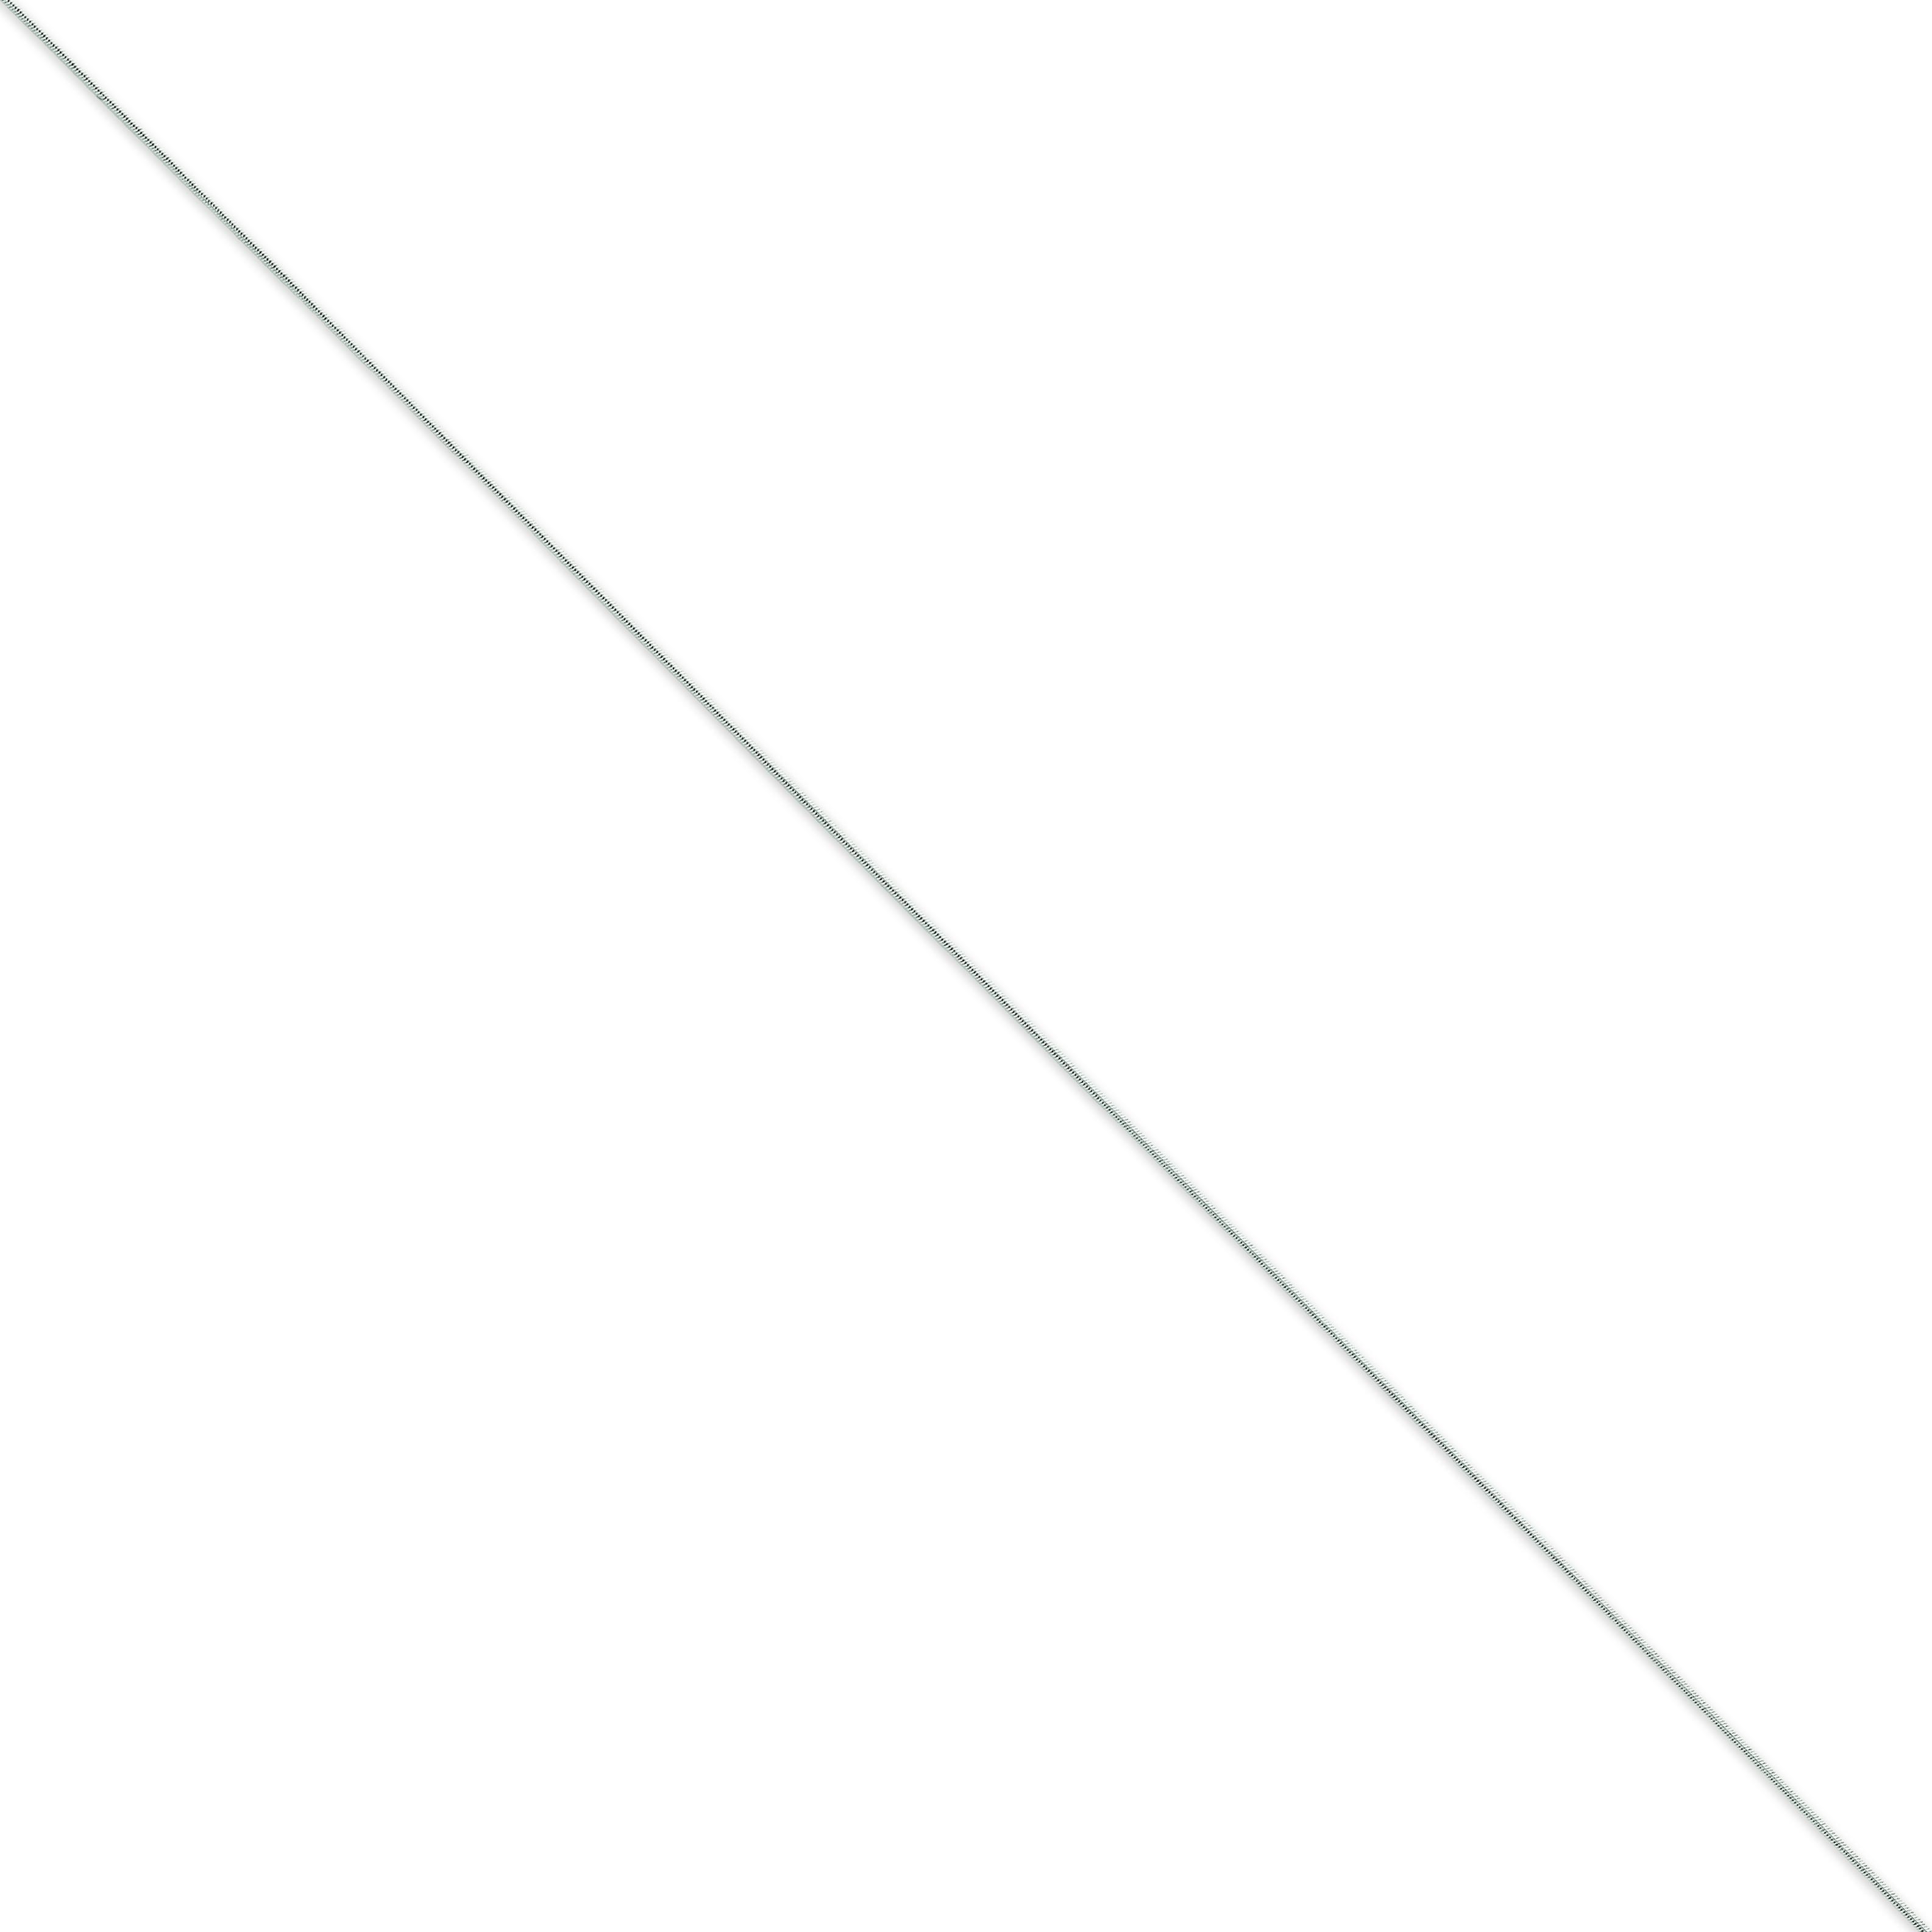 14k White Gold 16 inch 0.80 mm Snake Choker Necklace